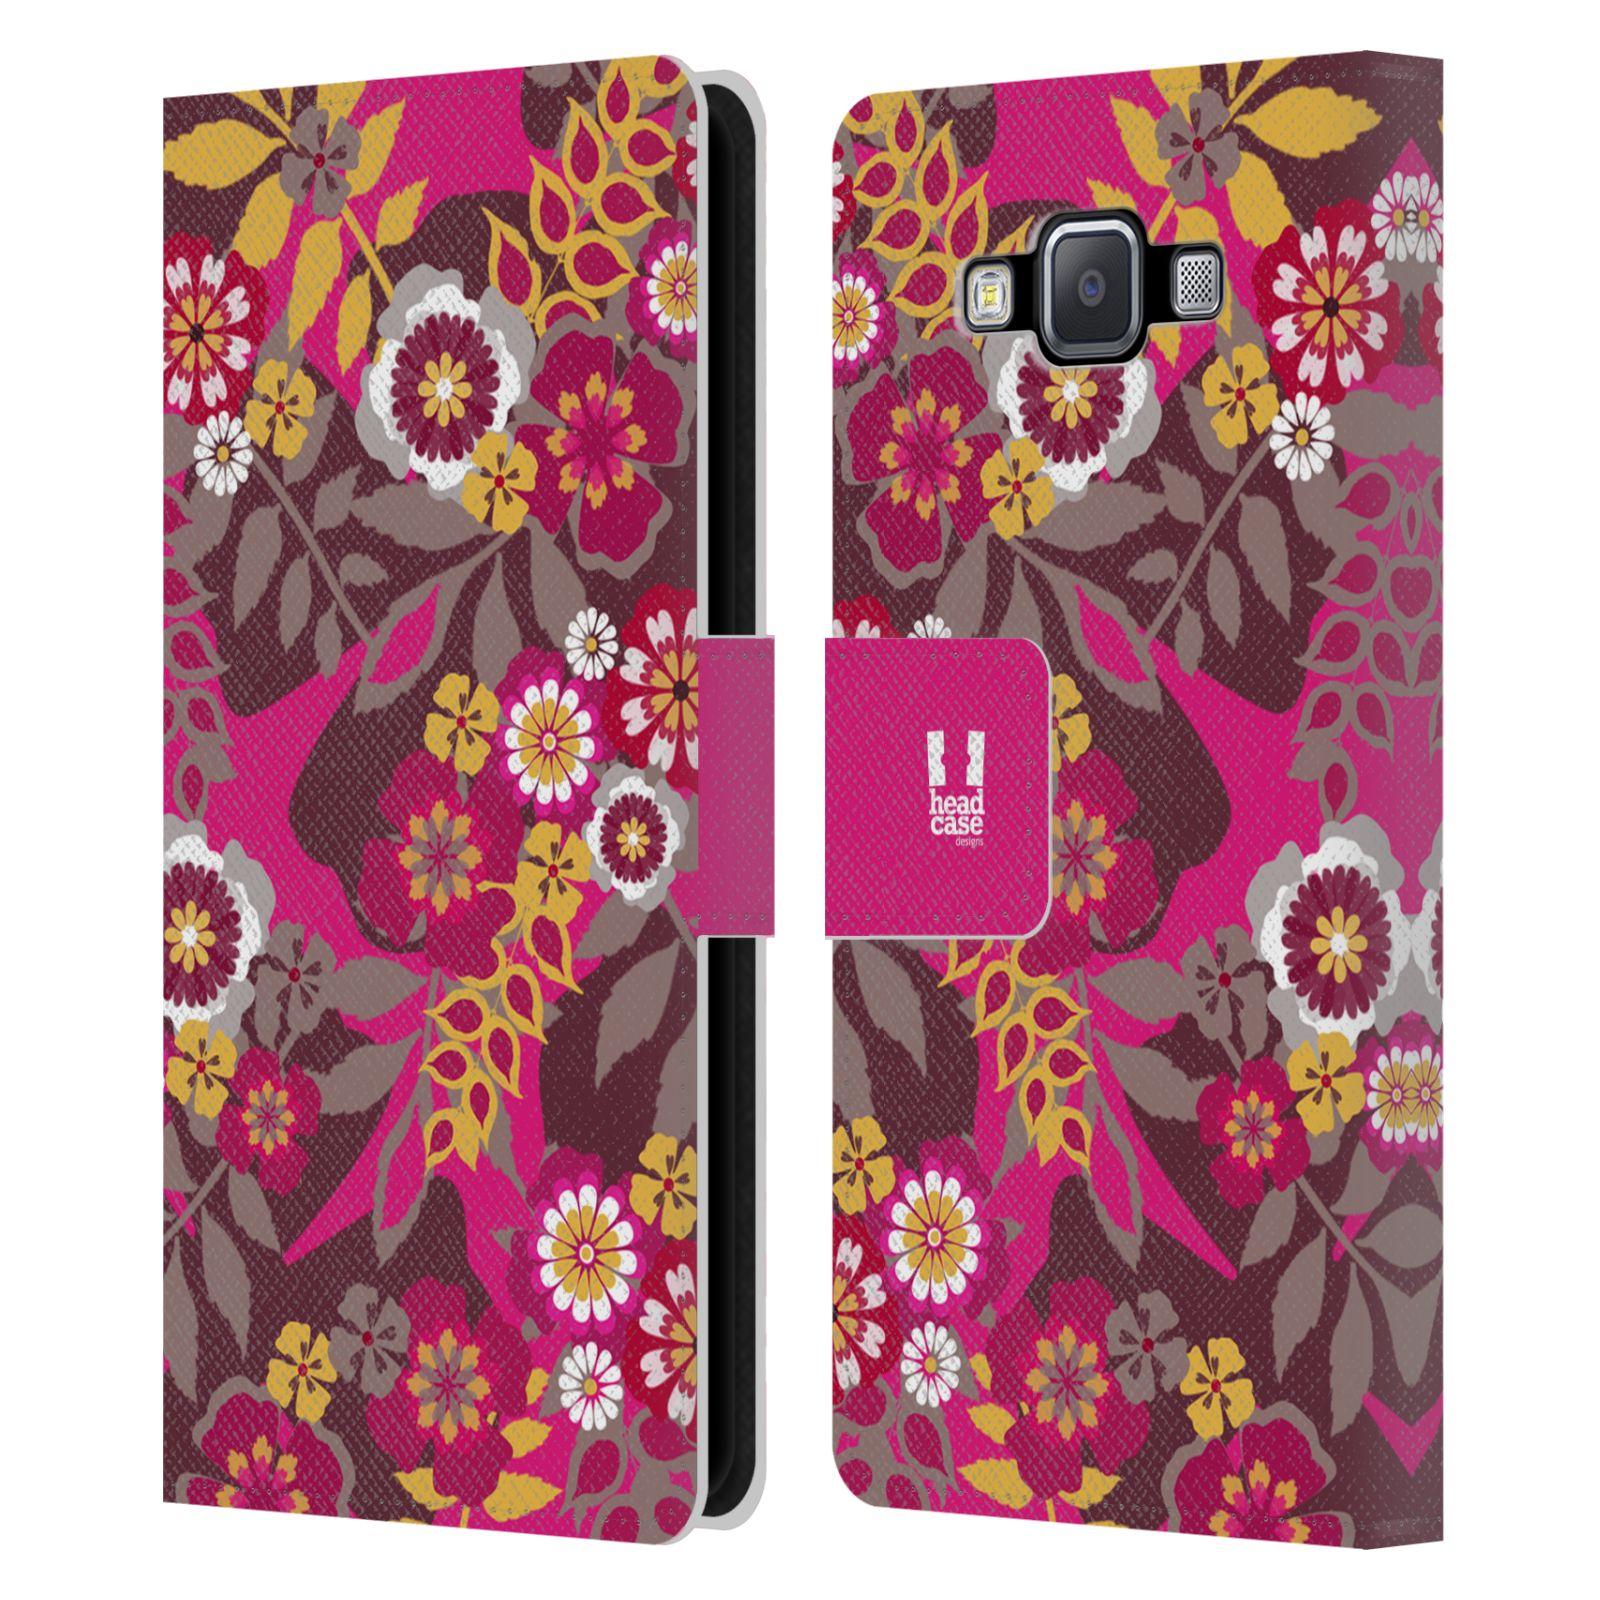 HEAD CASE Flipové pouzdro pro mobil Samsung Galaxy A5 BOTANIKA růžová a hnědá